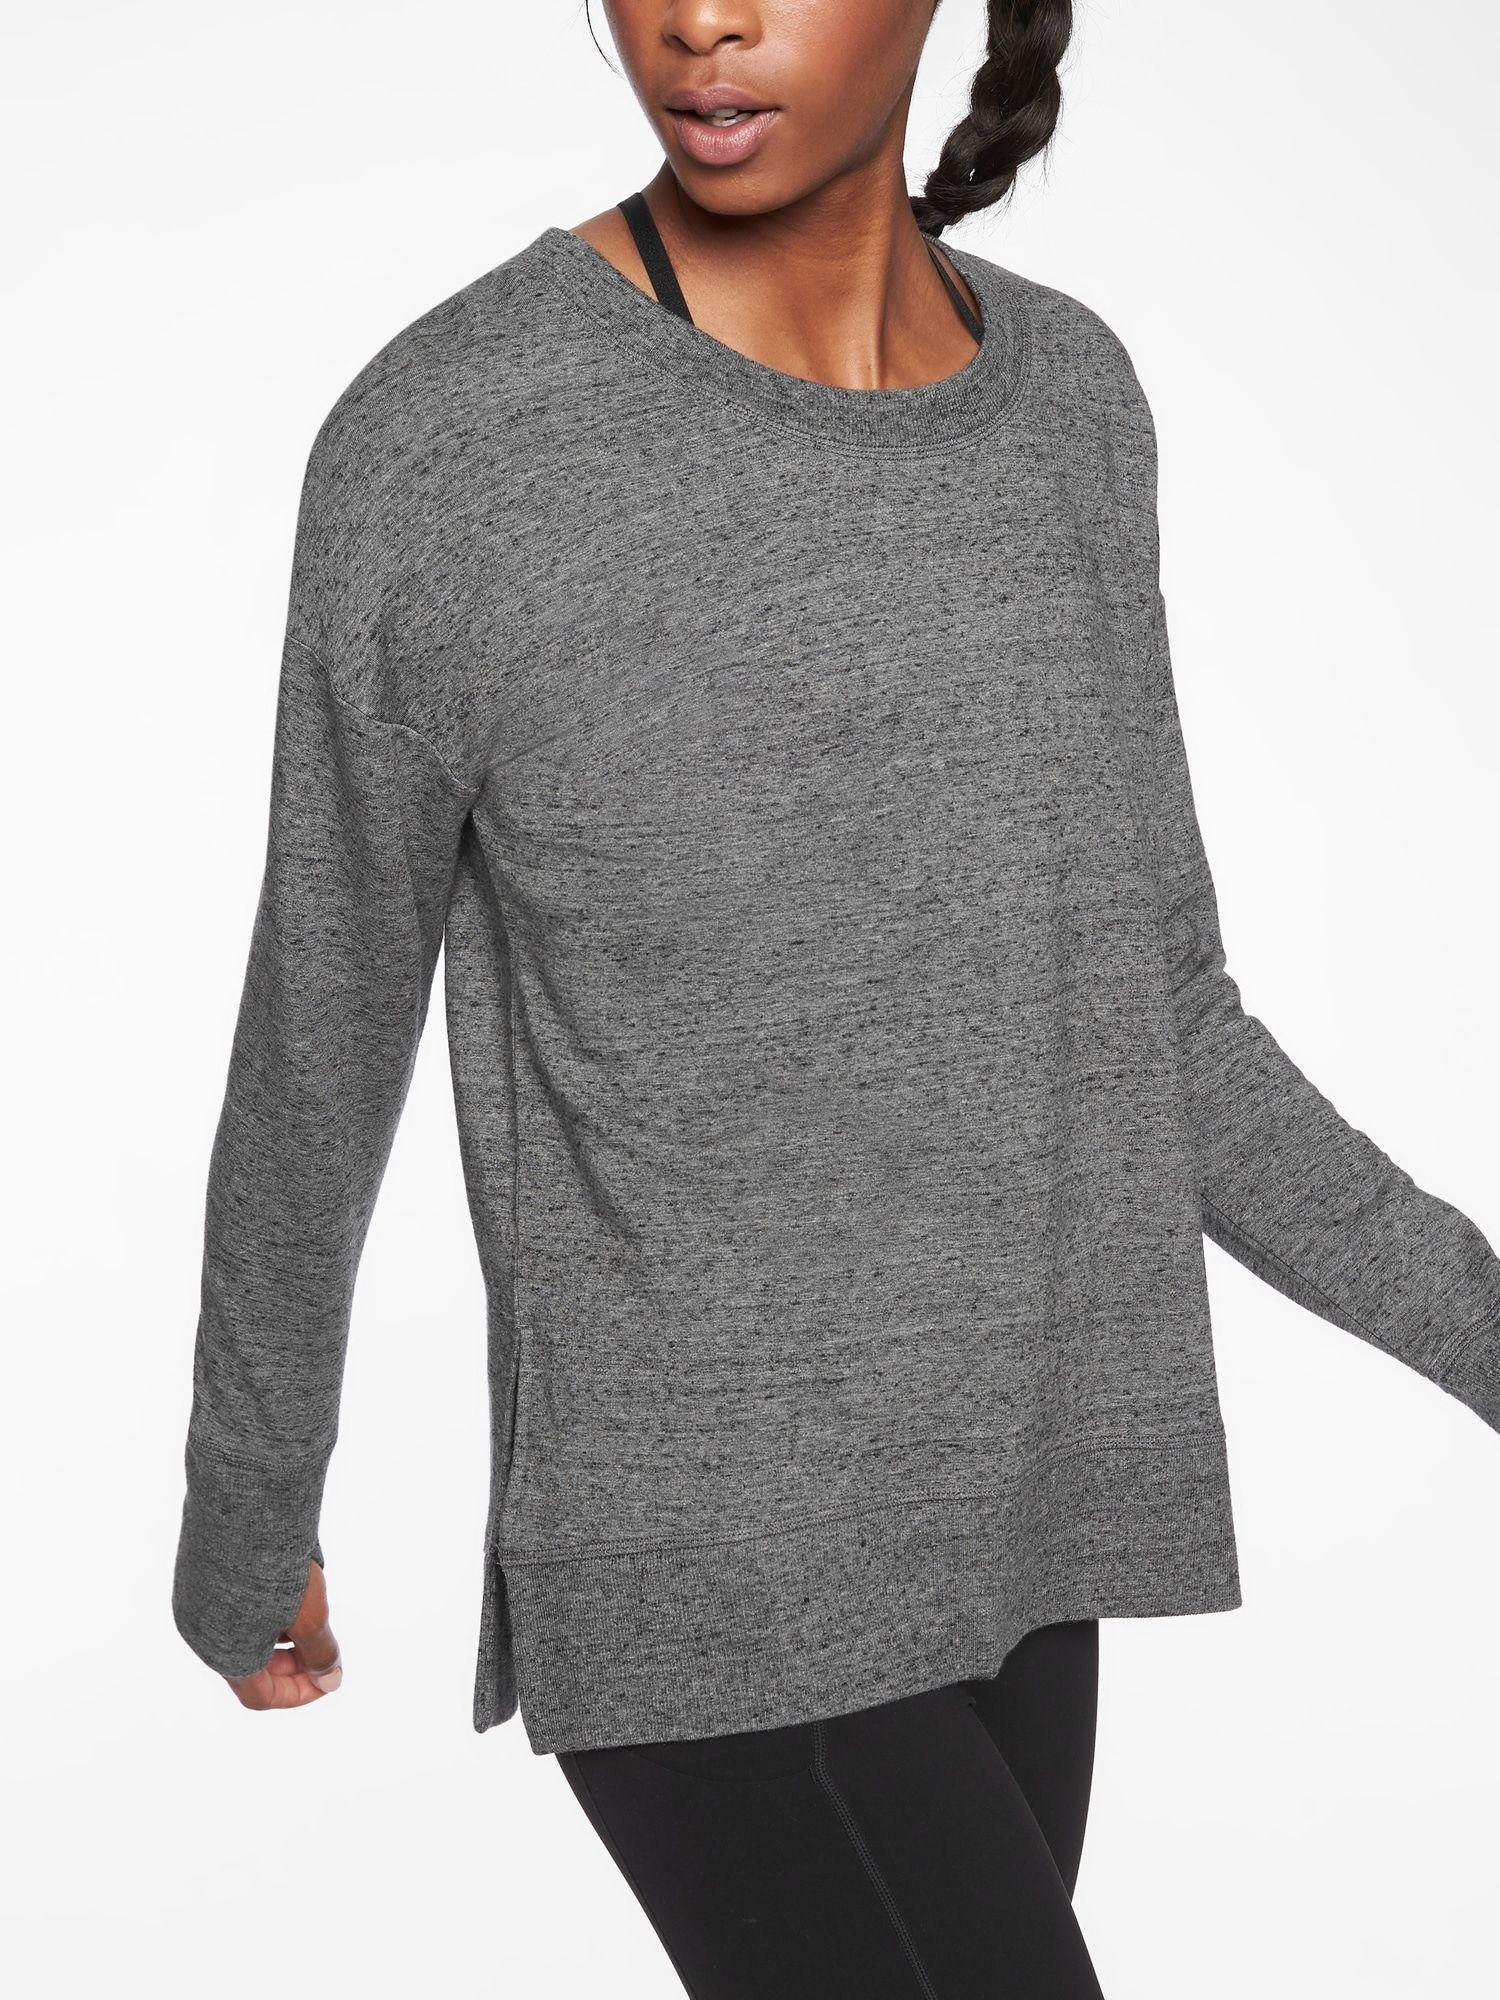 Coaster Luxe Sweatshirt Athleta Workout Tops For Women Athletic Tops Women Sweatshirts Women [ 2000 x 1500 Pixel ]